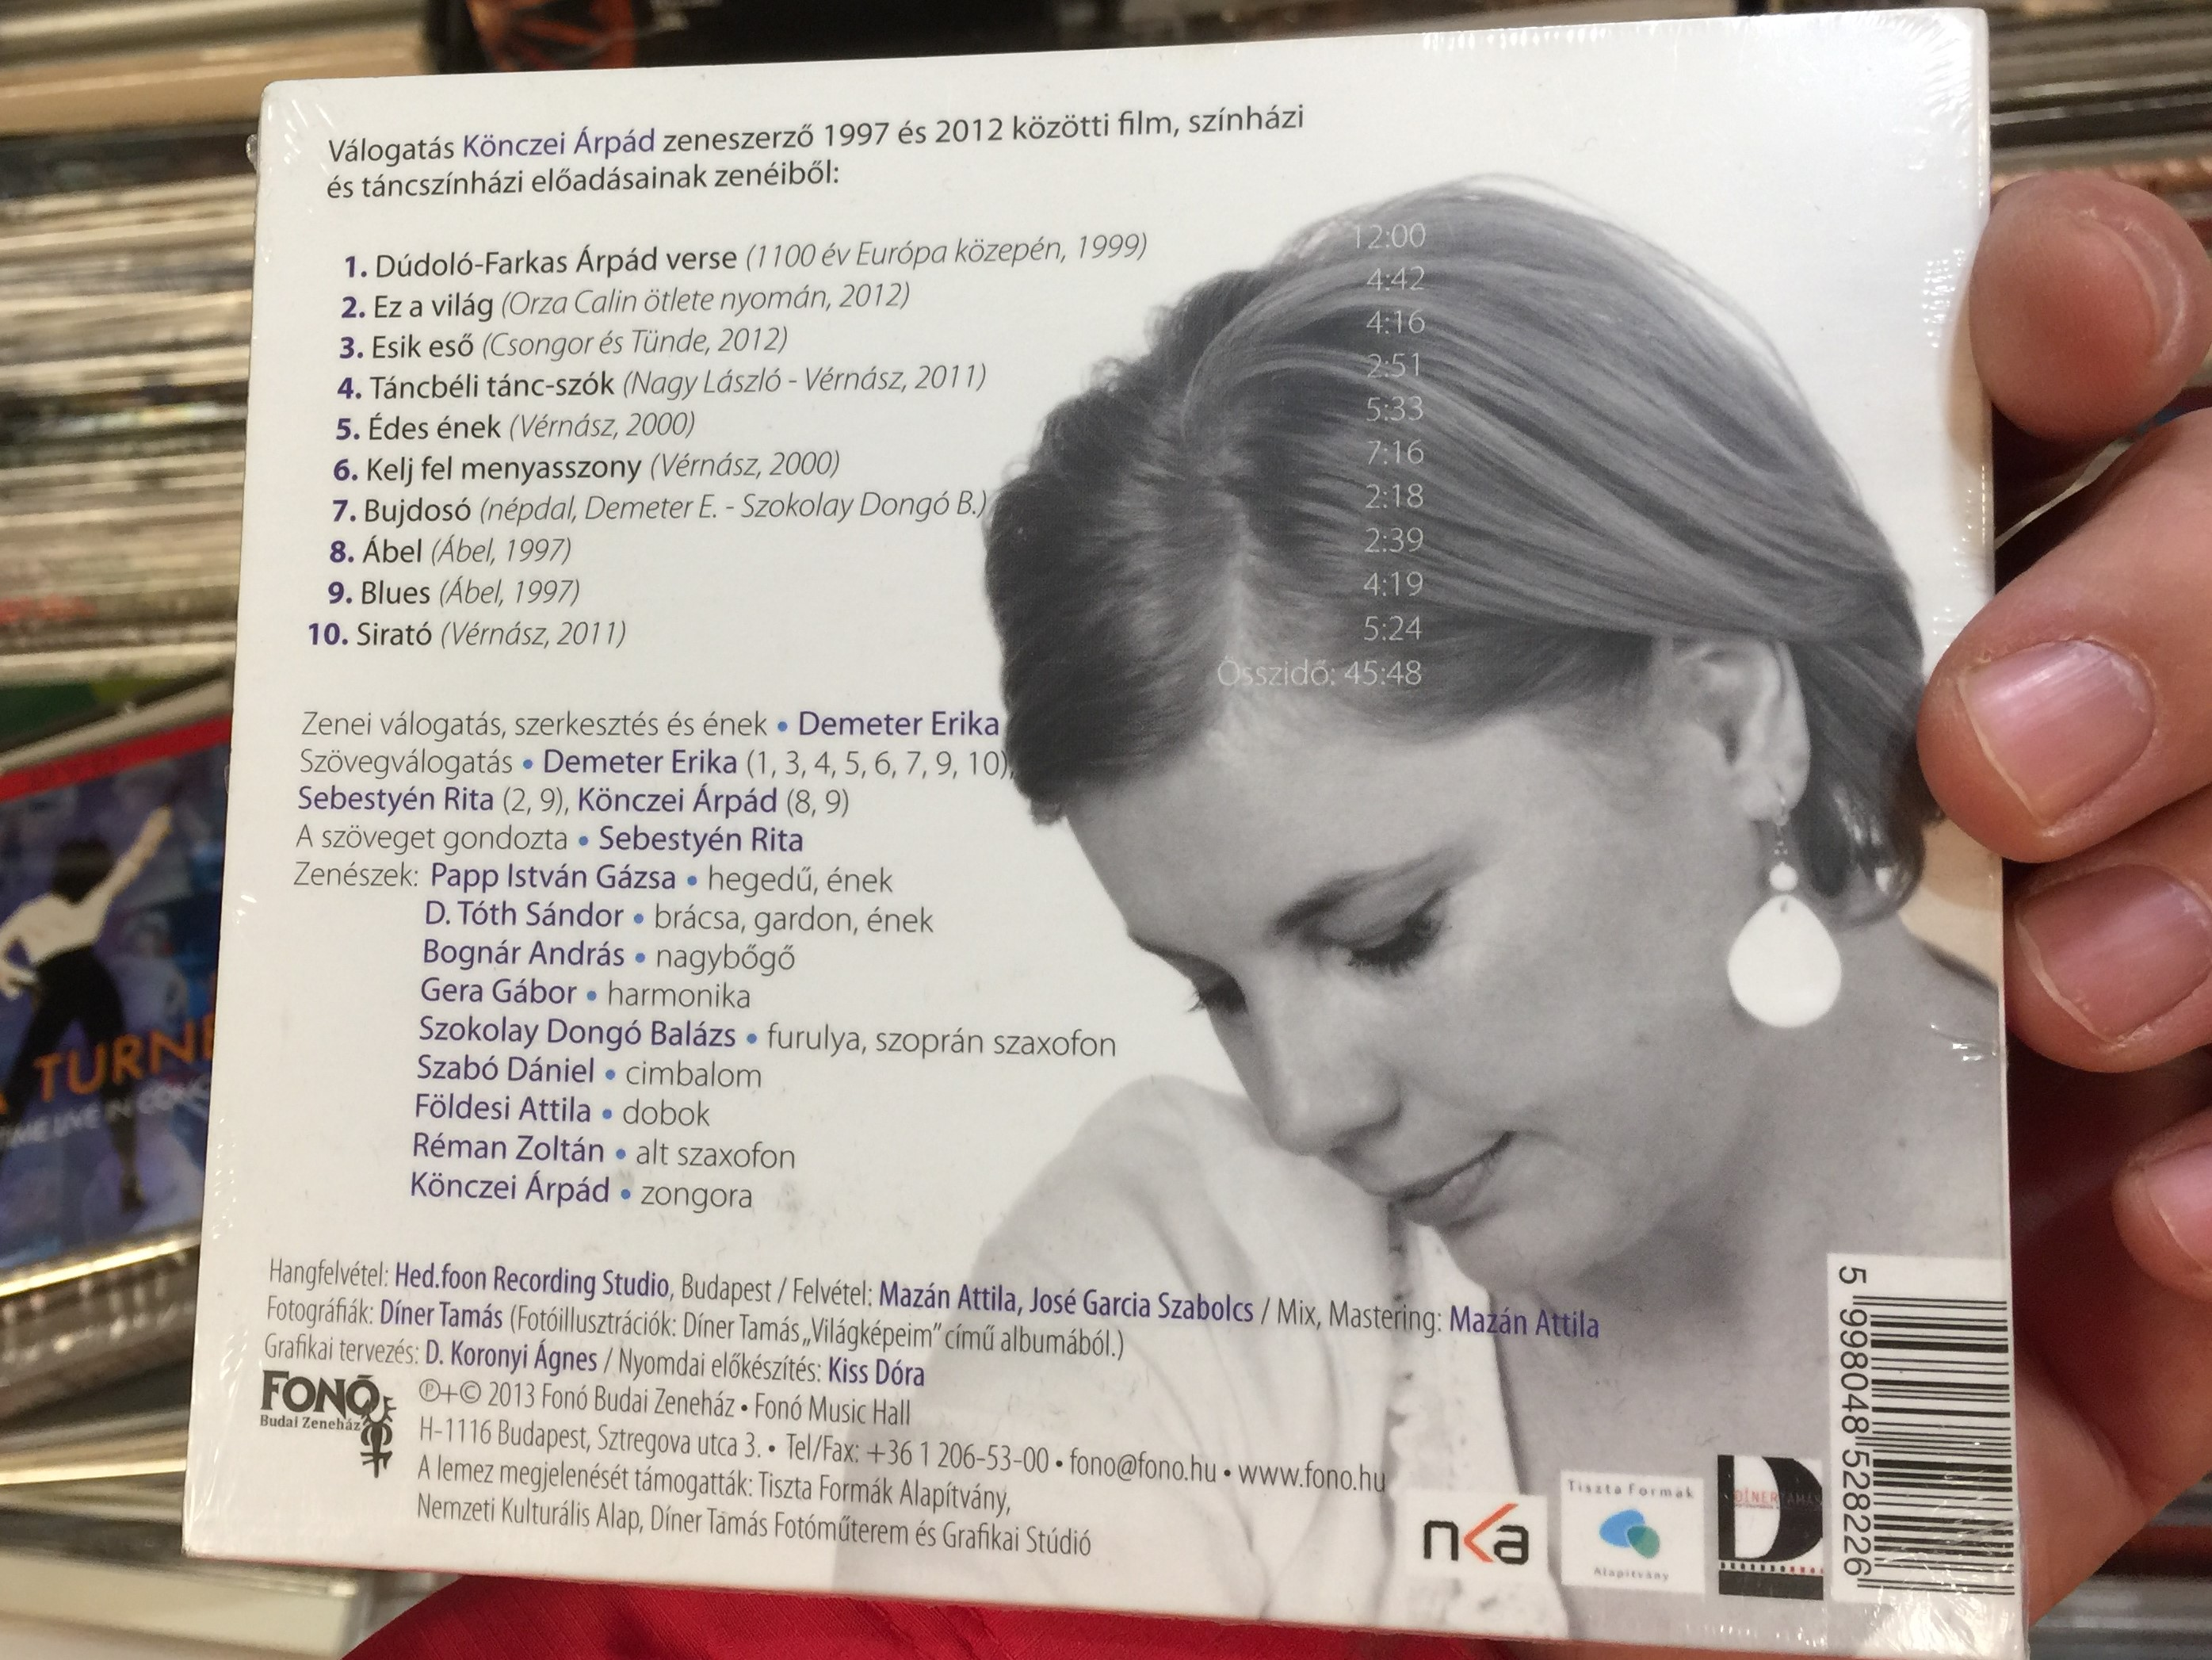 des-nek-vil-g.-zene.-demeter-erika-fon-budai-zeneh-z-audio-cd-2013-fa-282-2-2-.jpg